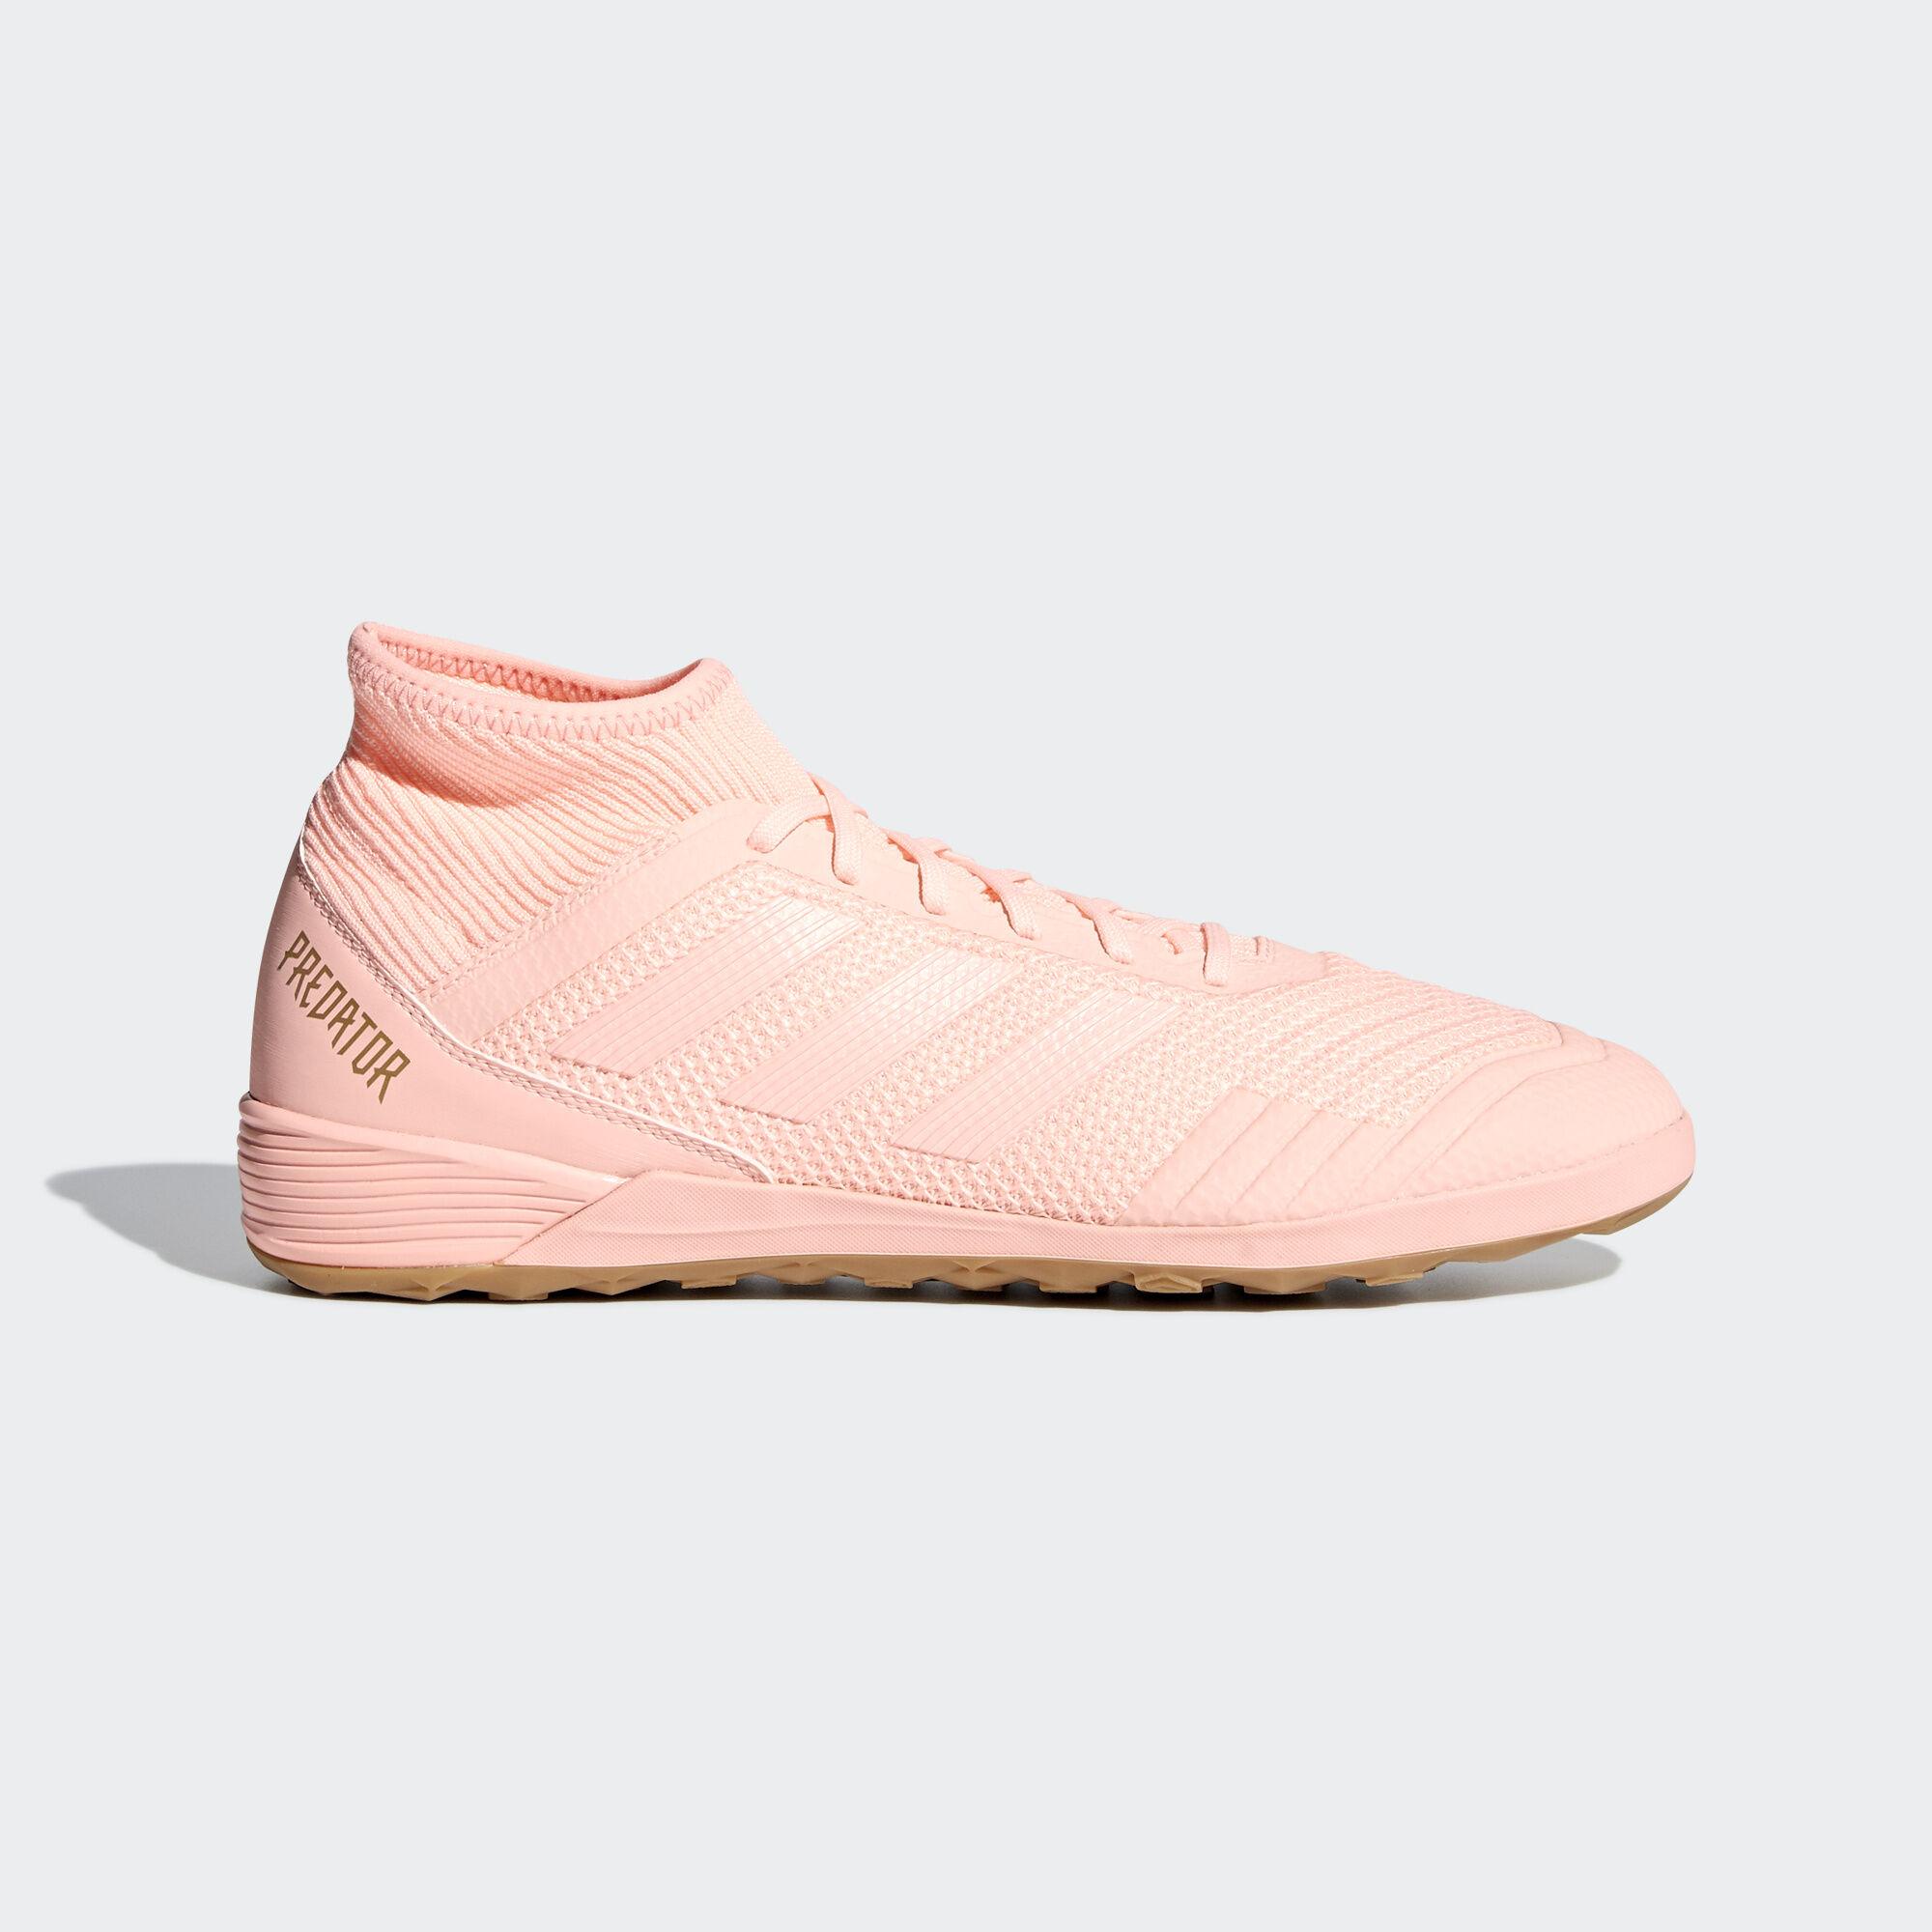 9d4366c2 ... wholesale adidas predator tango 18.3 indoor boots clear orange clear  orange clear orange db2127 ce2dc 1b25d